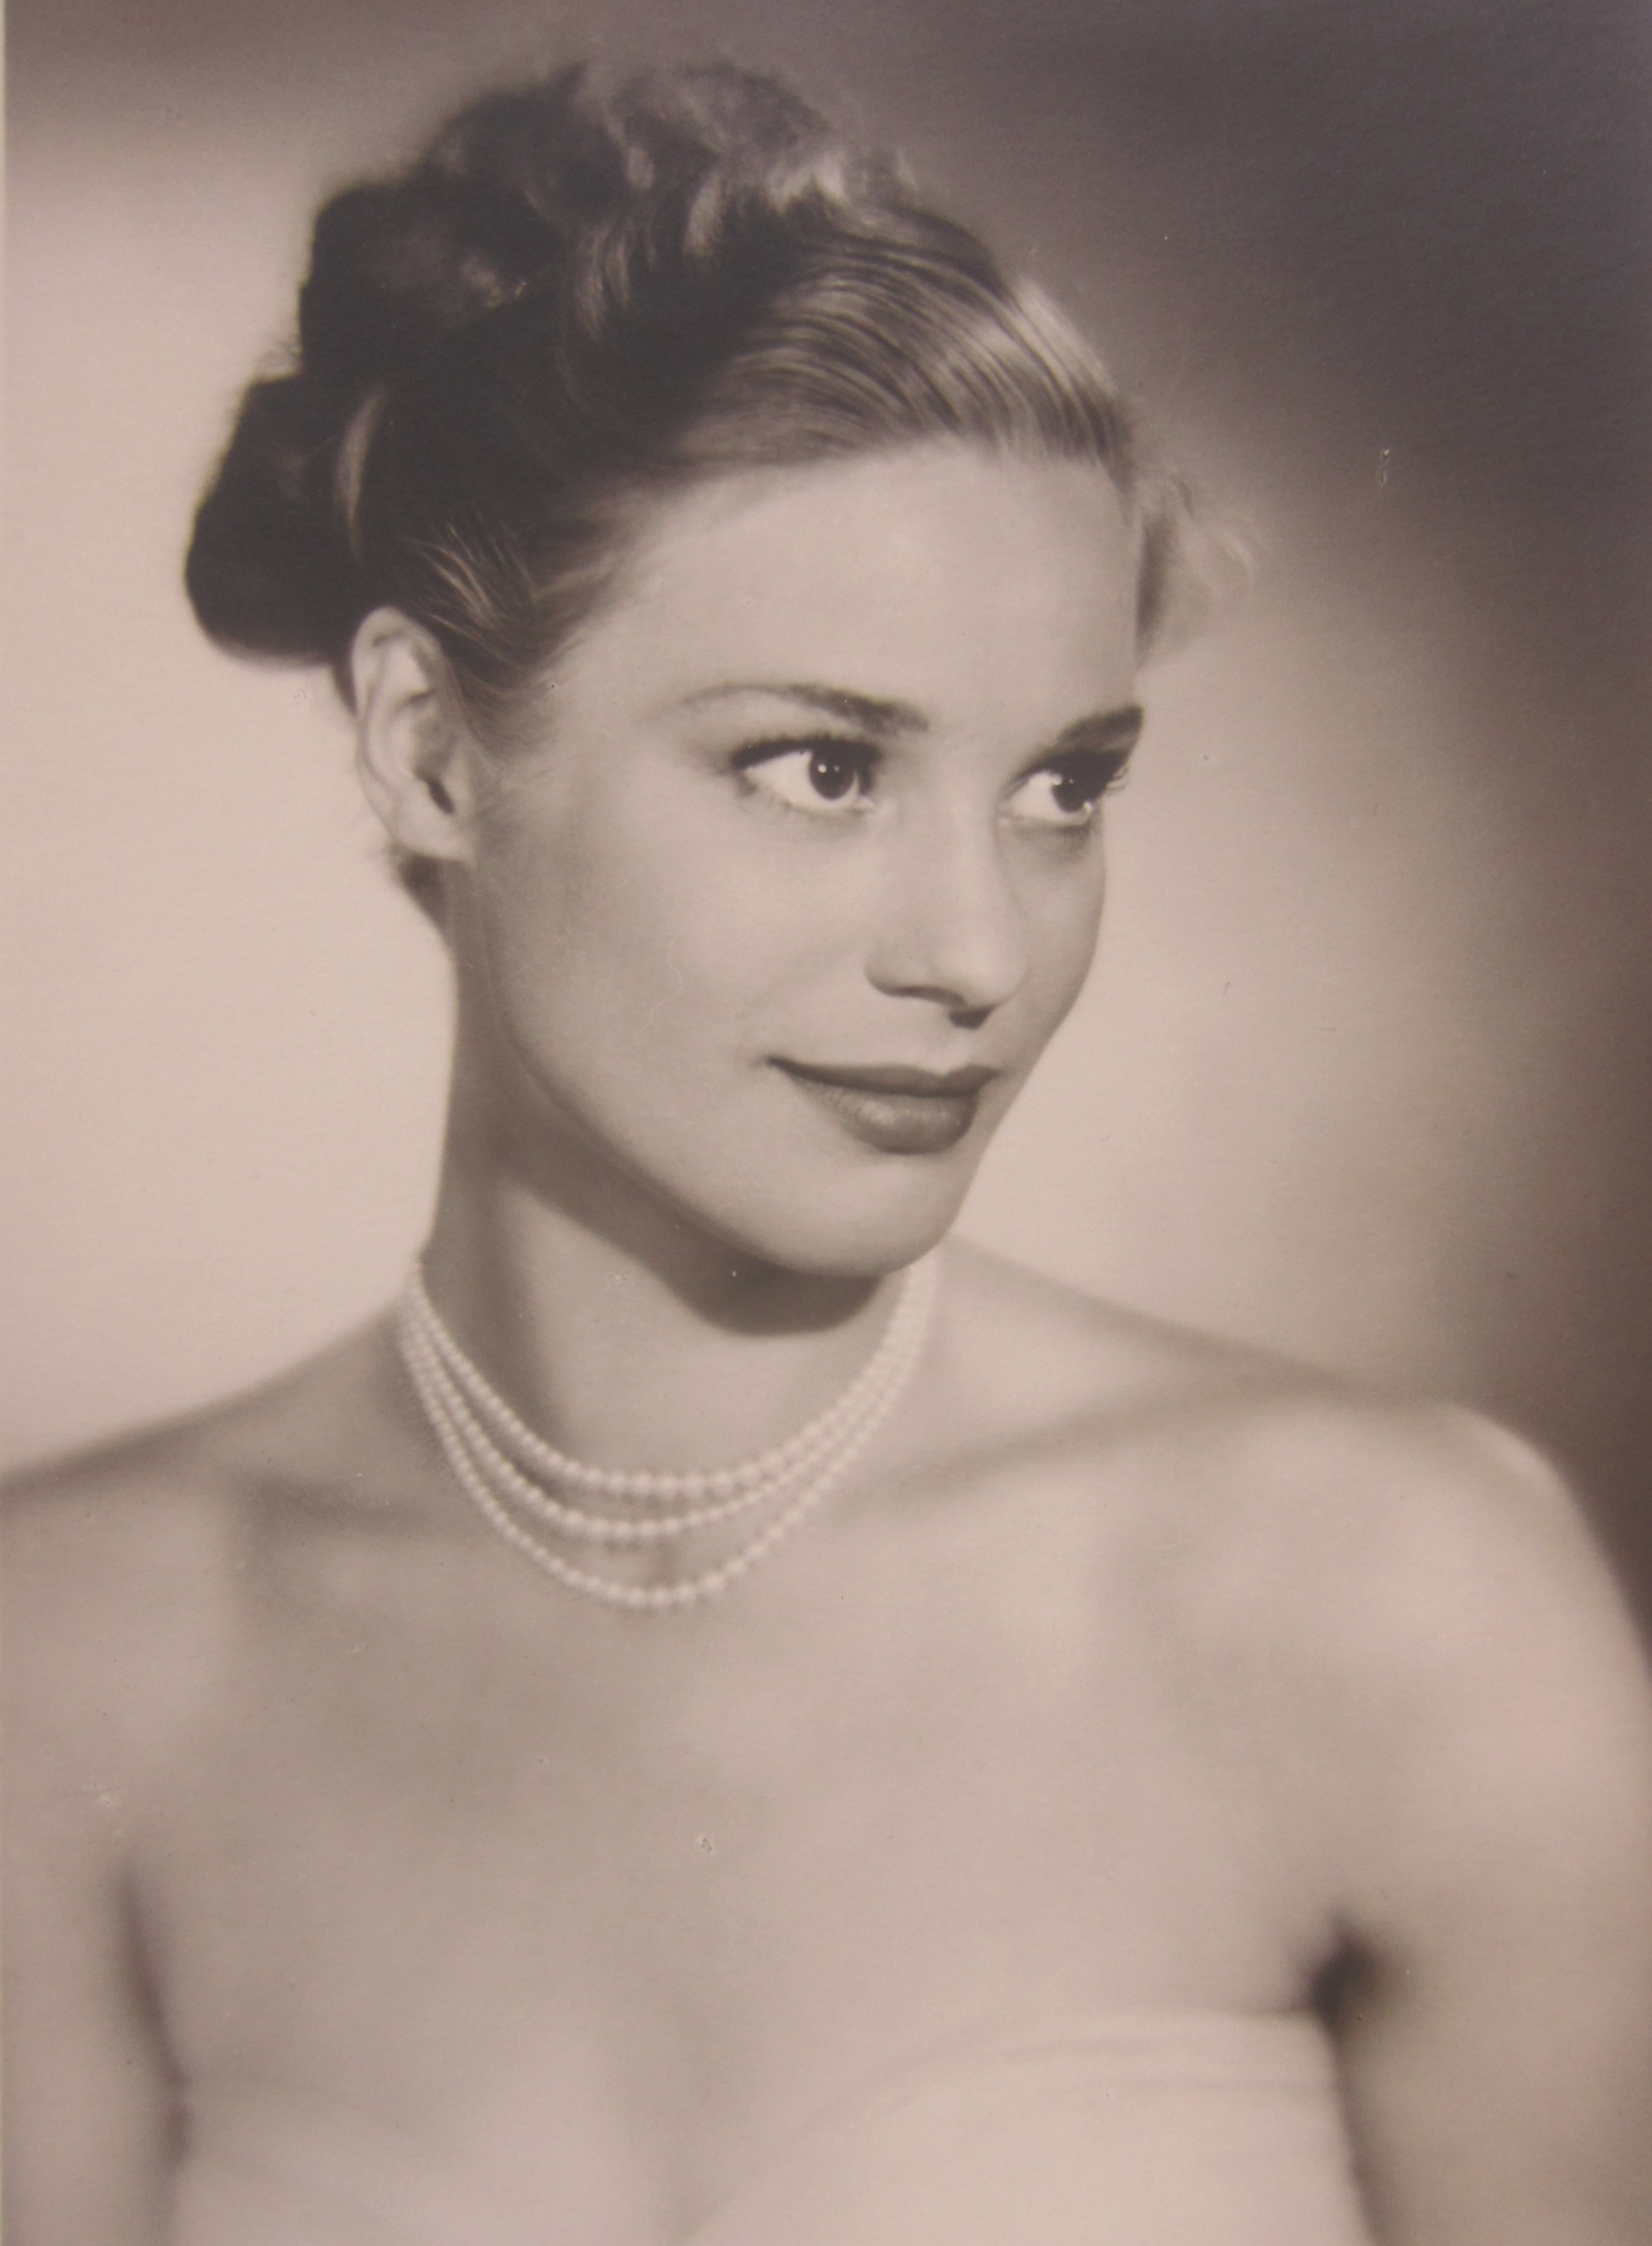 Ingrid_Thulin_1926-2004 -